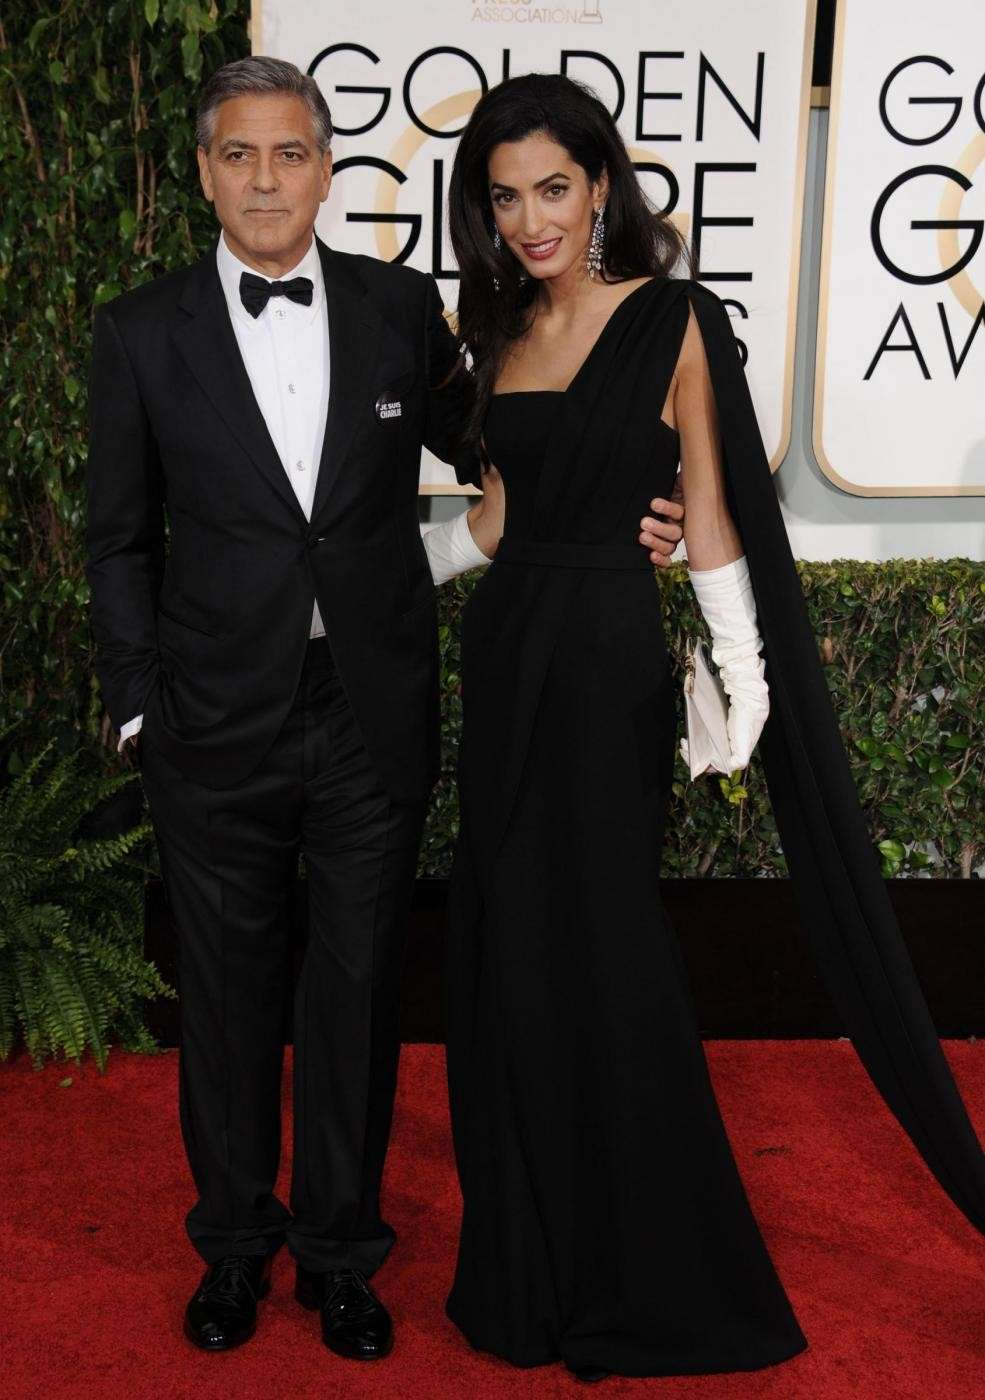 I due innamorati vip ai Golden Globe 2015